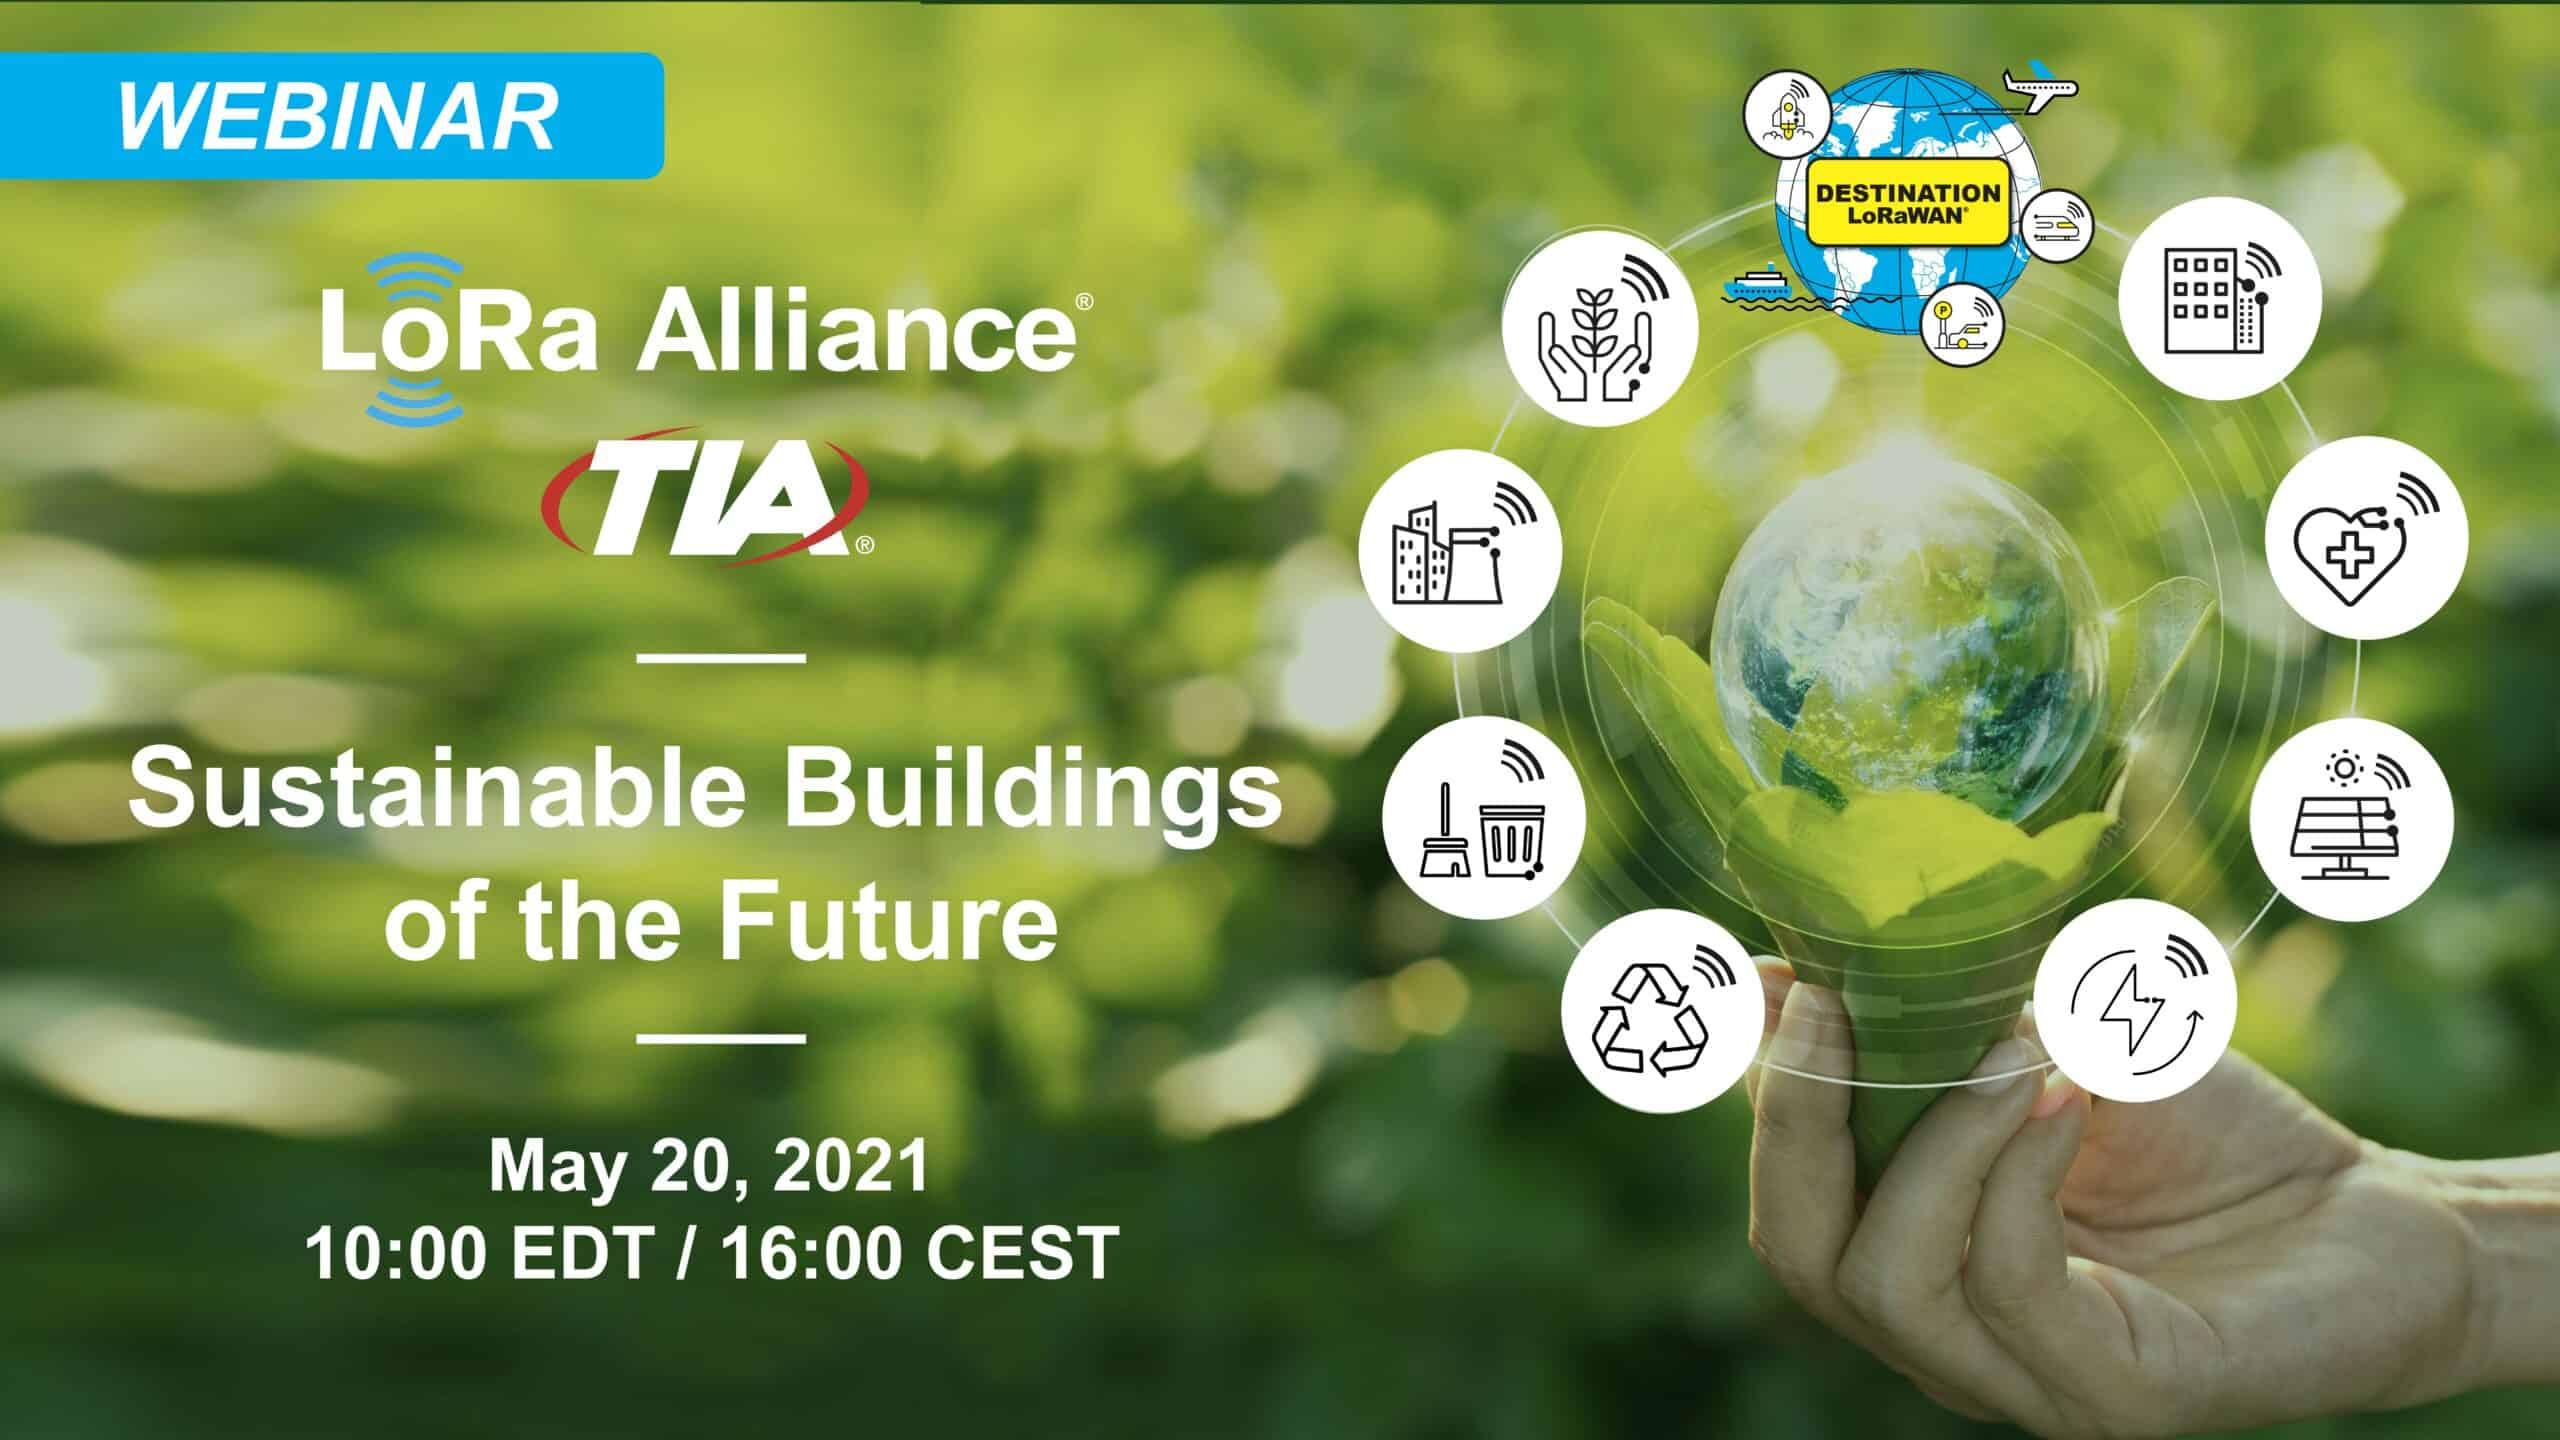 Sustainable Buildings - LA and TIA promo image